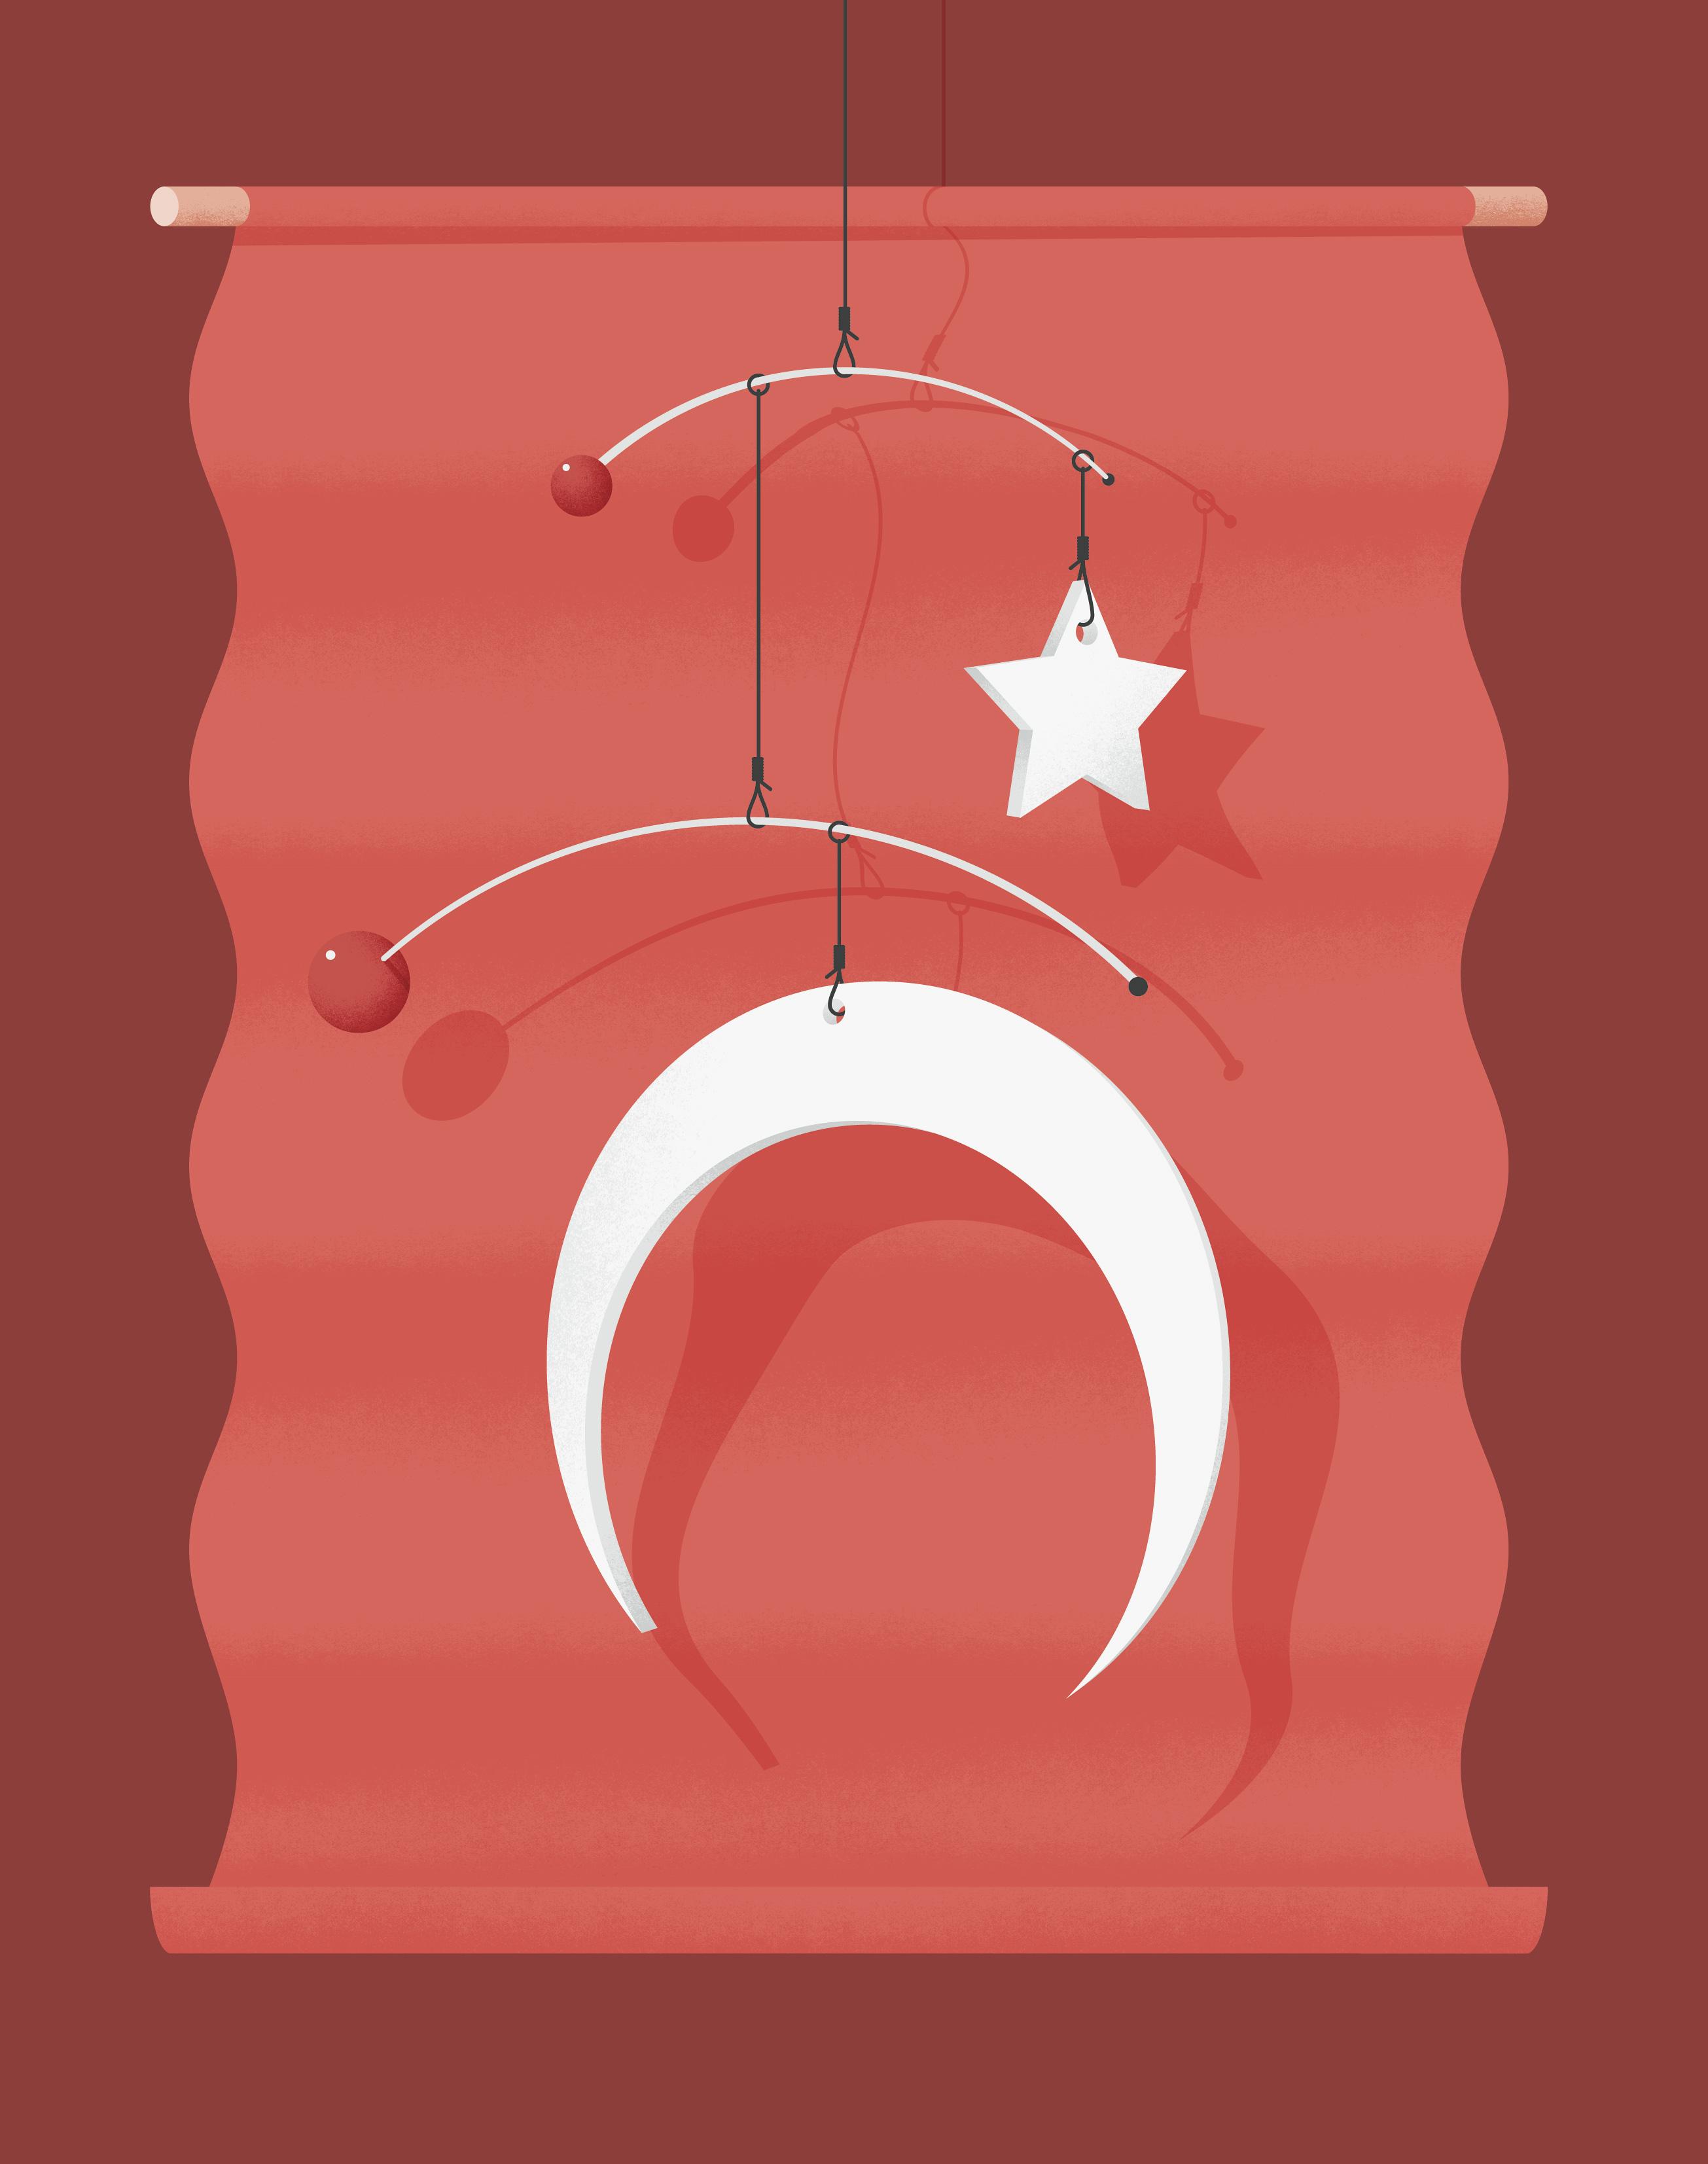 On hardships facing Turkish immigrants